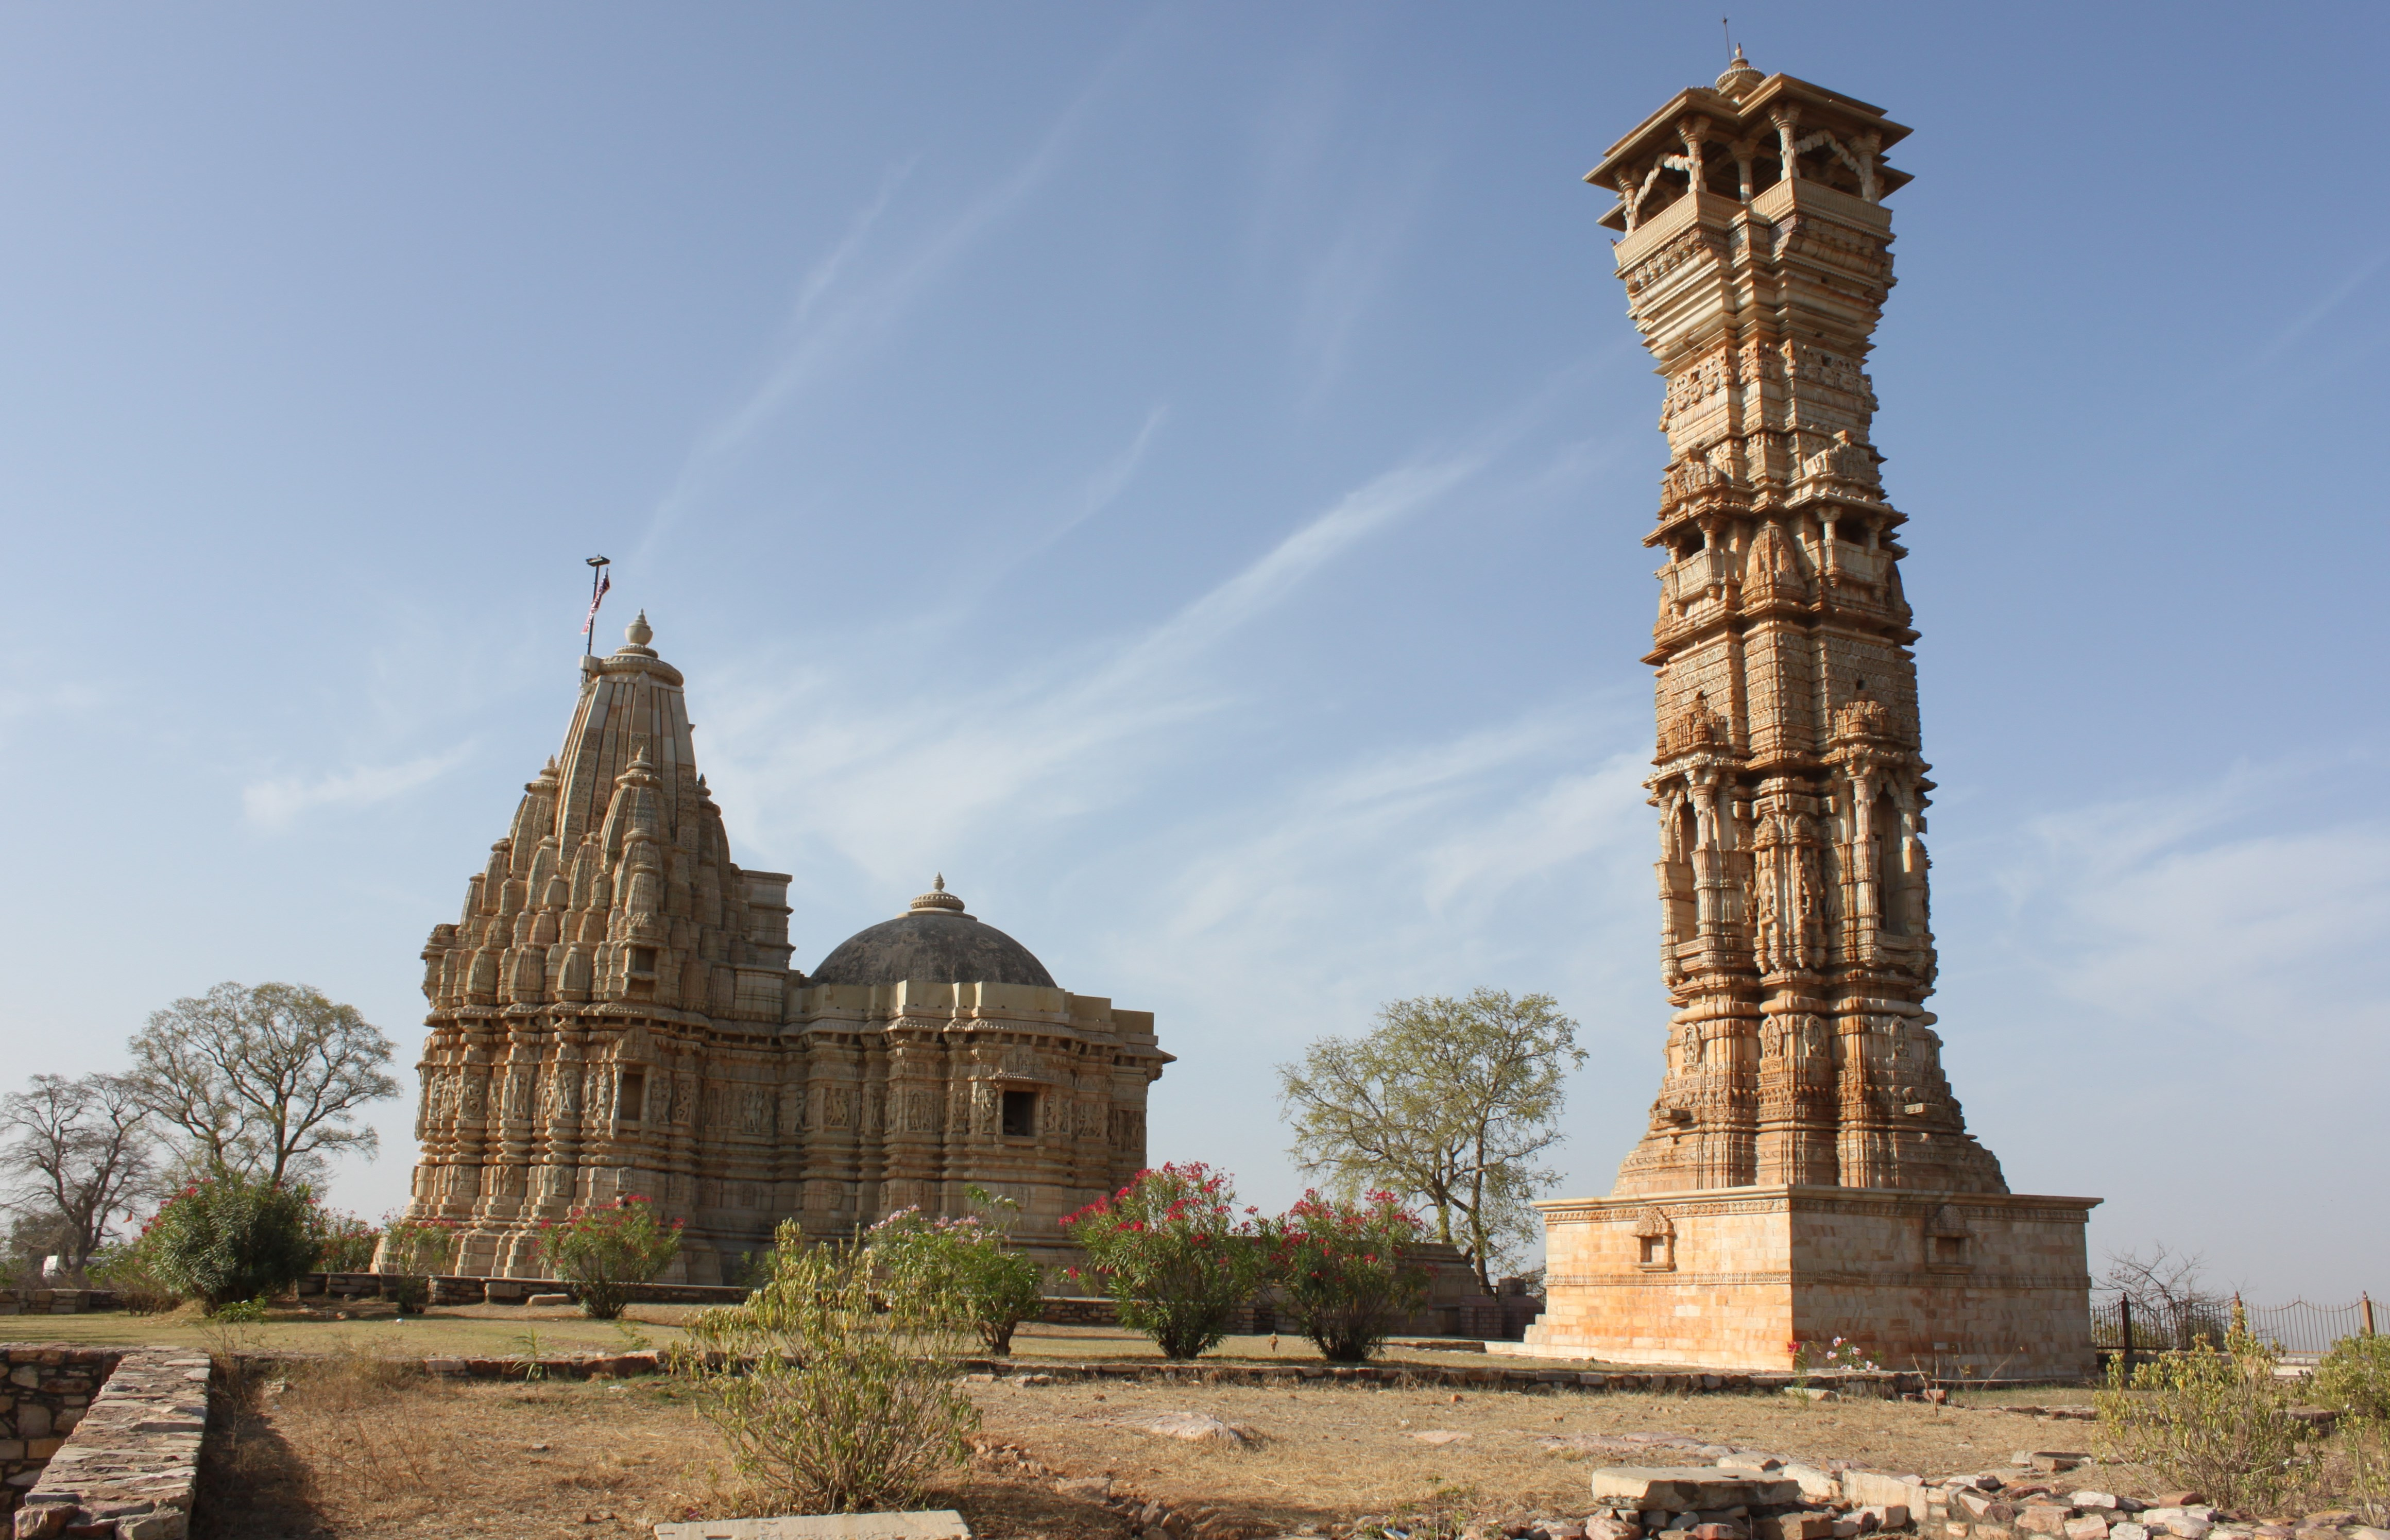 Kirti Stambha (Tower of Fame) 10